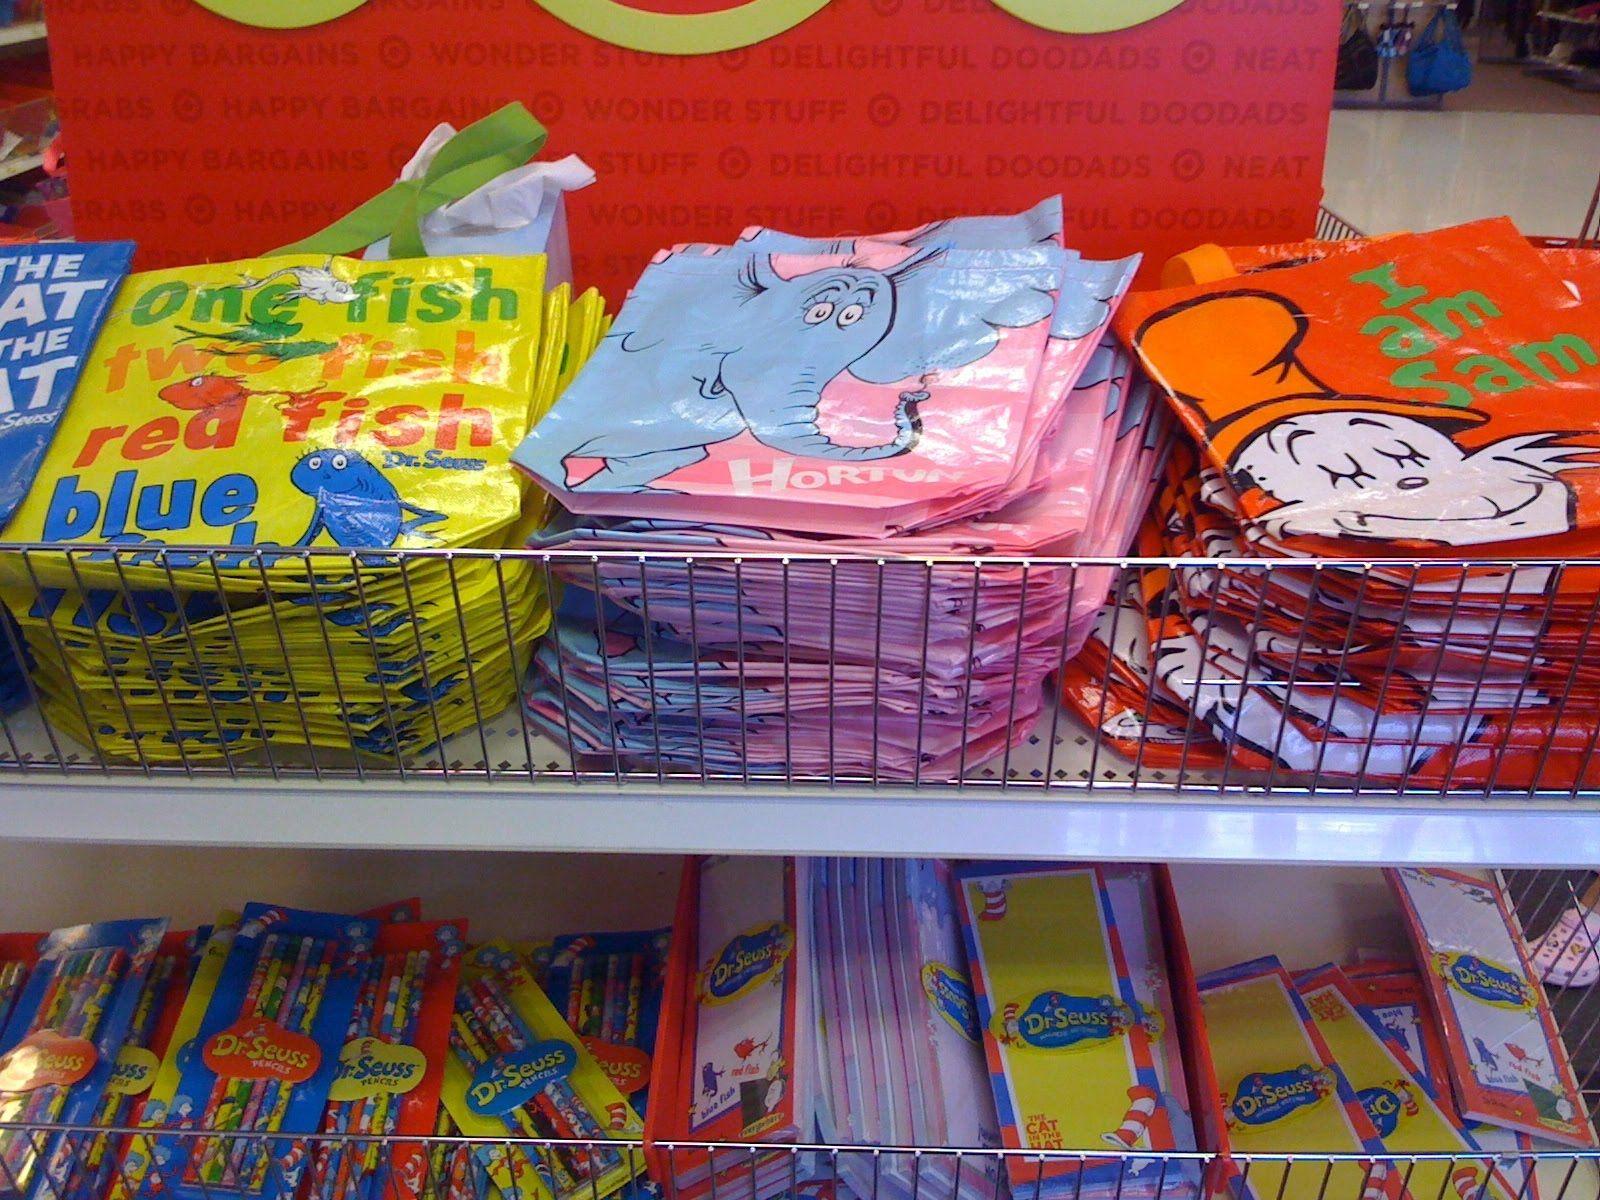 Kaylyn Hicks Steele Dr Seuss Bags Looks Like From Targets Aisle Goo